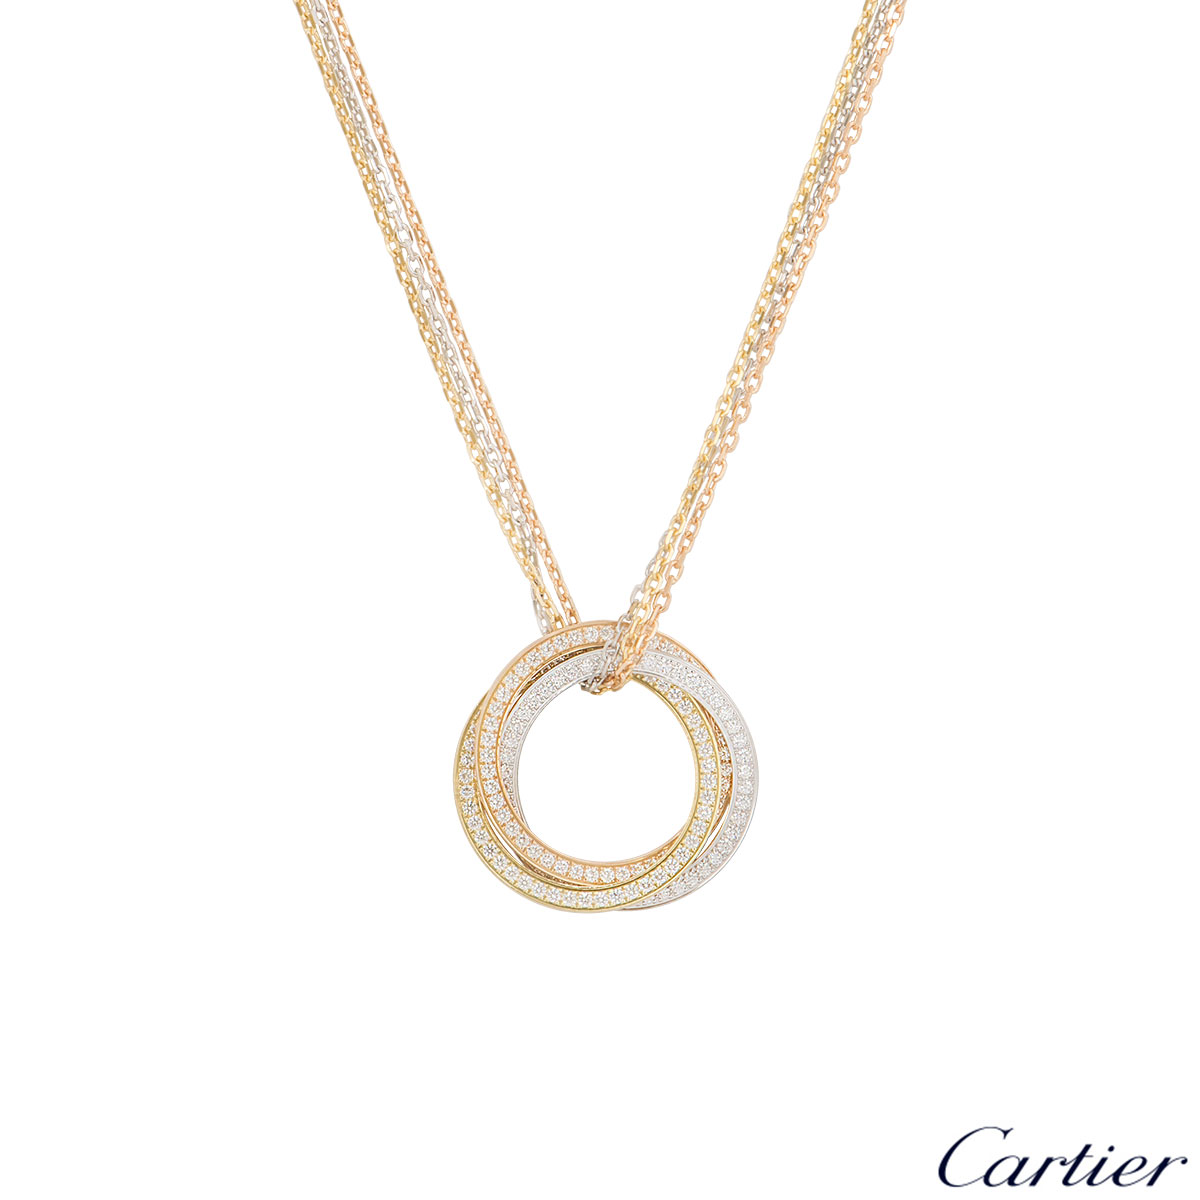 Cartier Trinity De Cartier Necklace